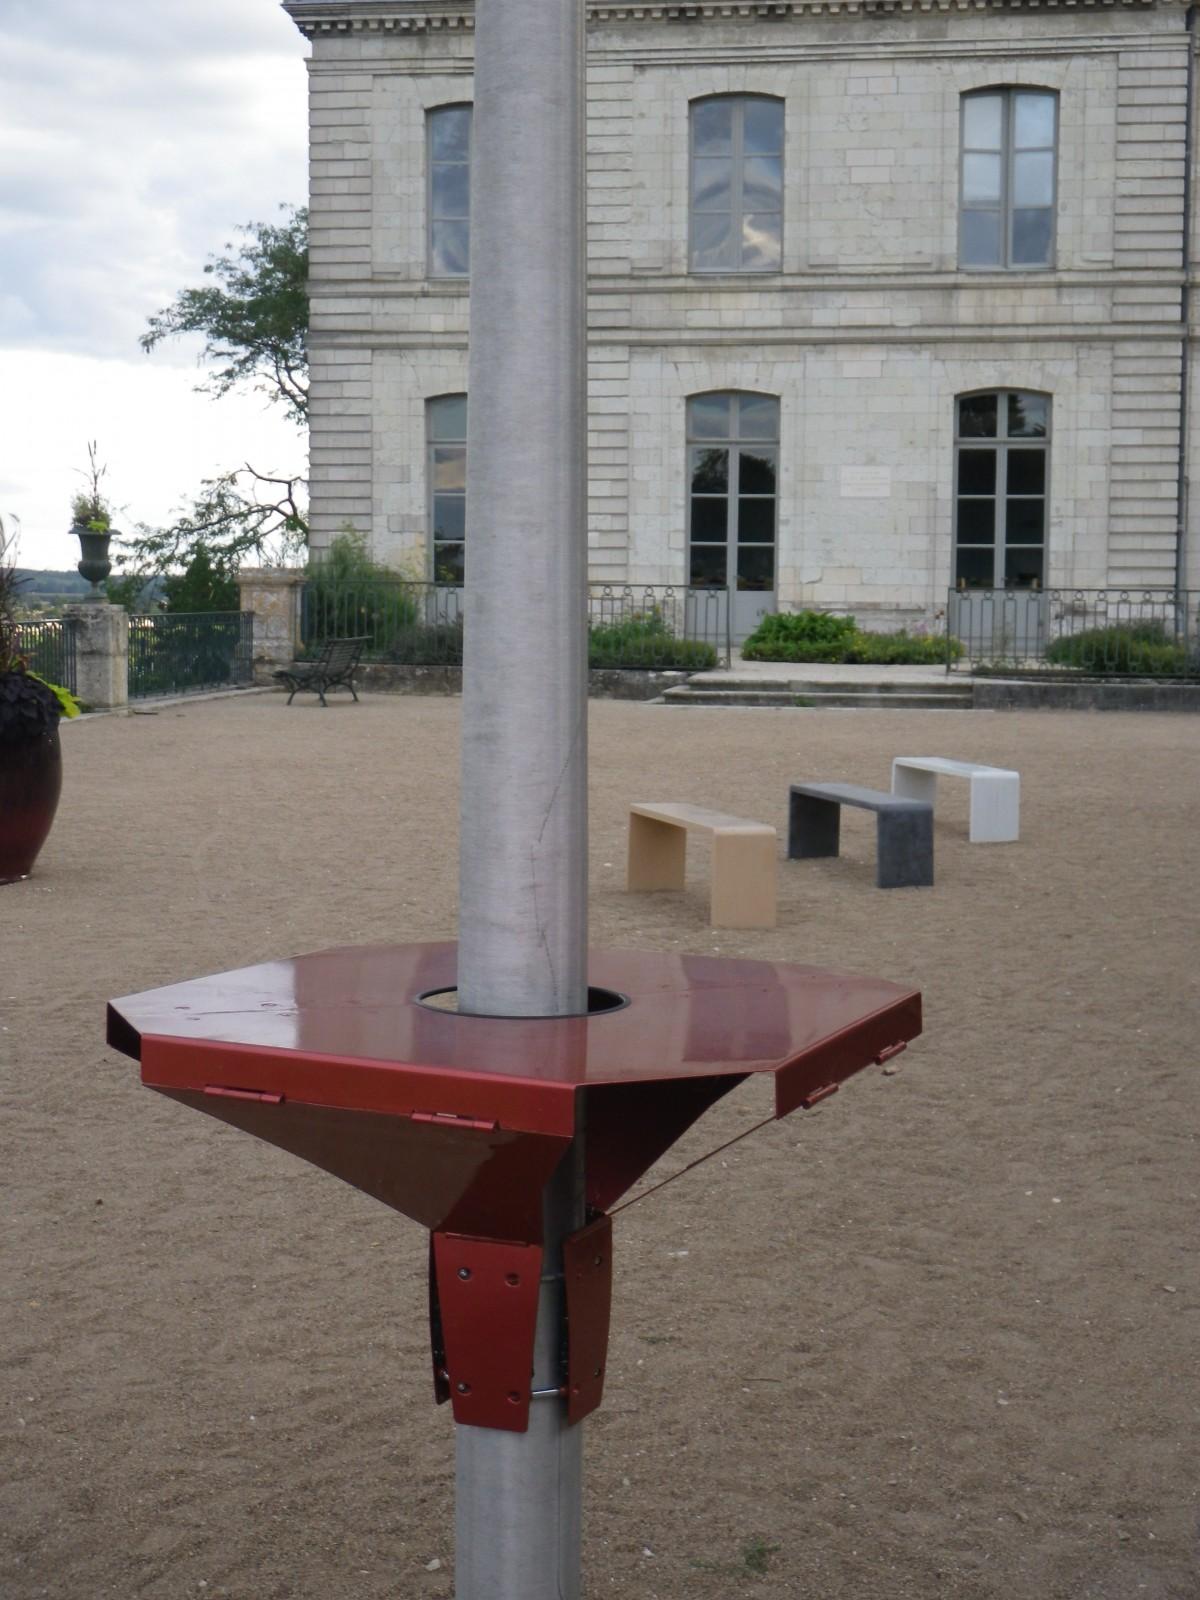 Plug in imagin par aur lie brunet de l agence wakup for Jardin urbain definition